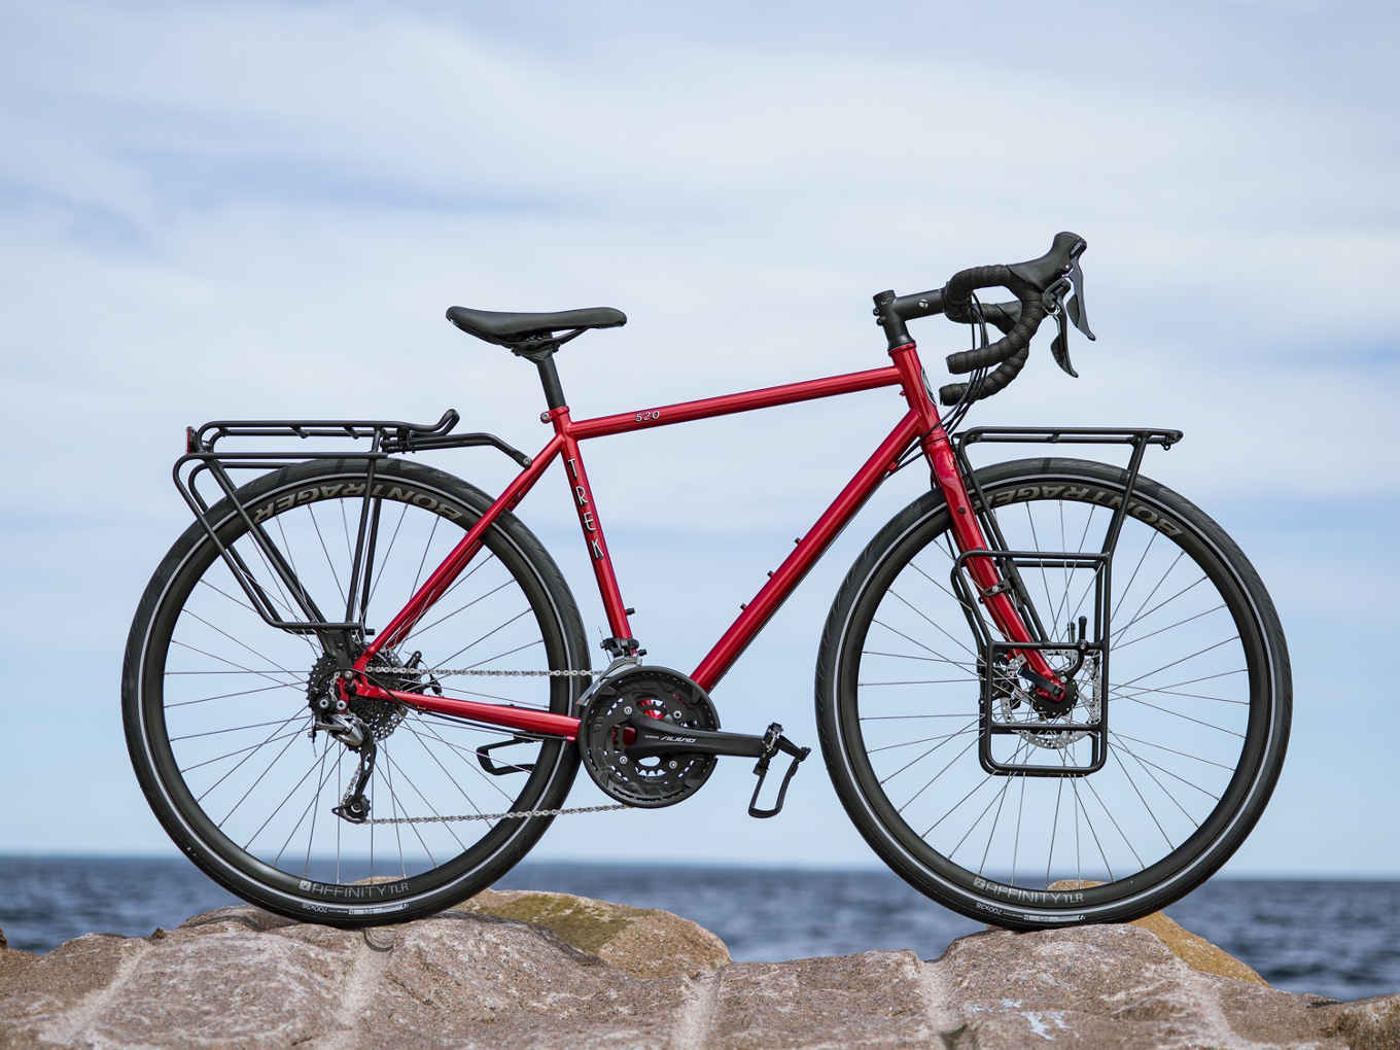 Trek's 2019 520 Disc Touring Bike